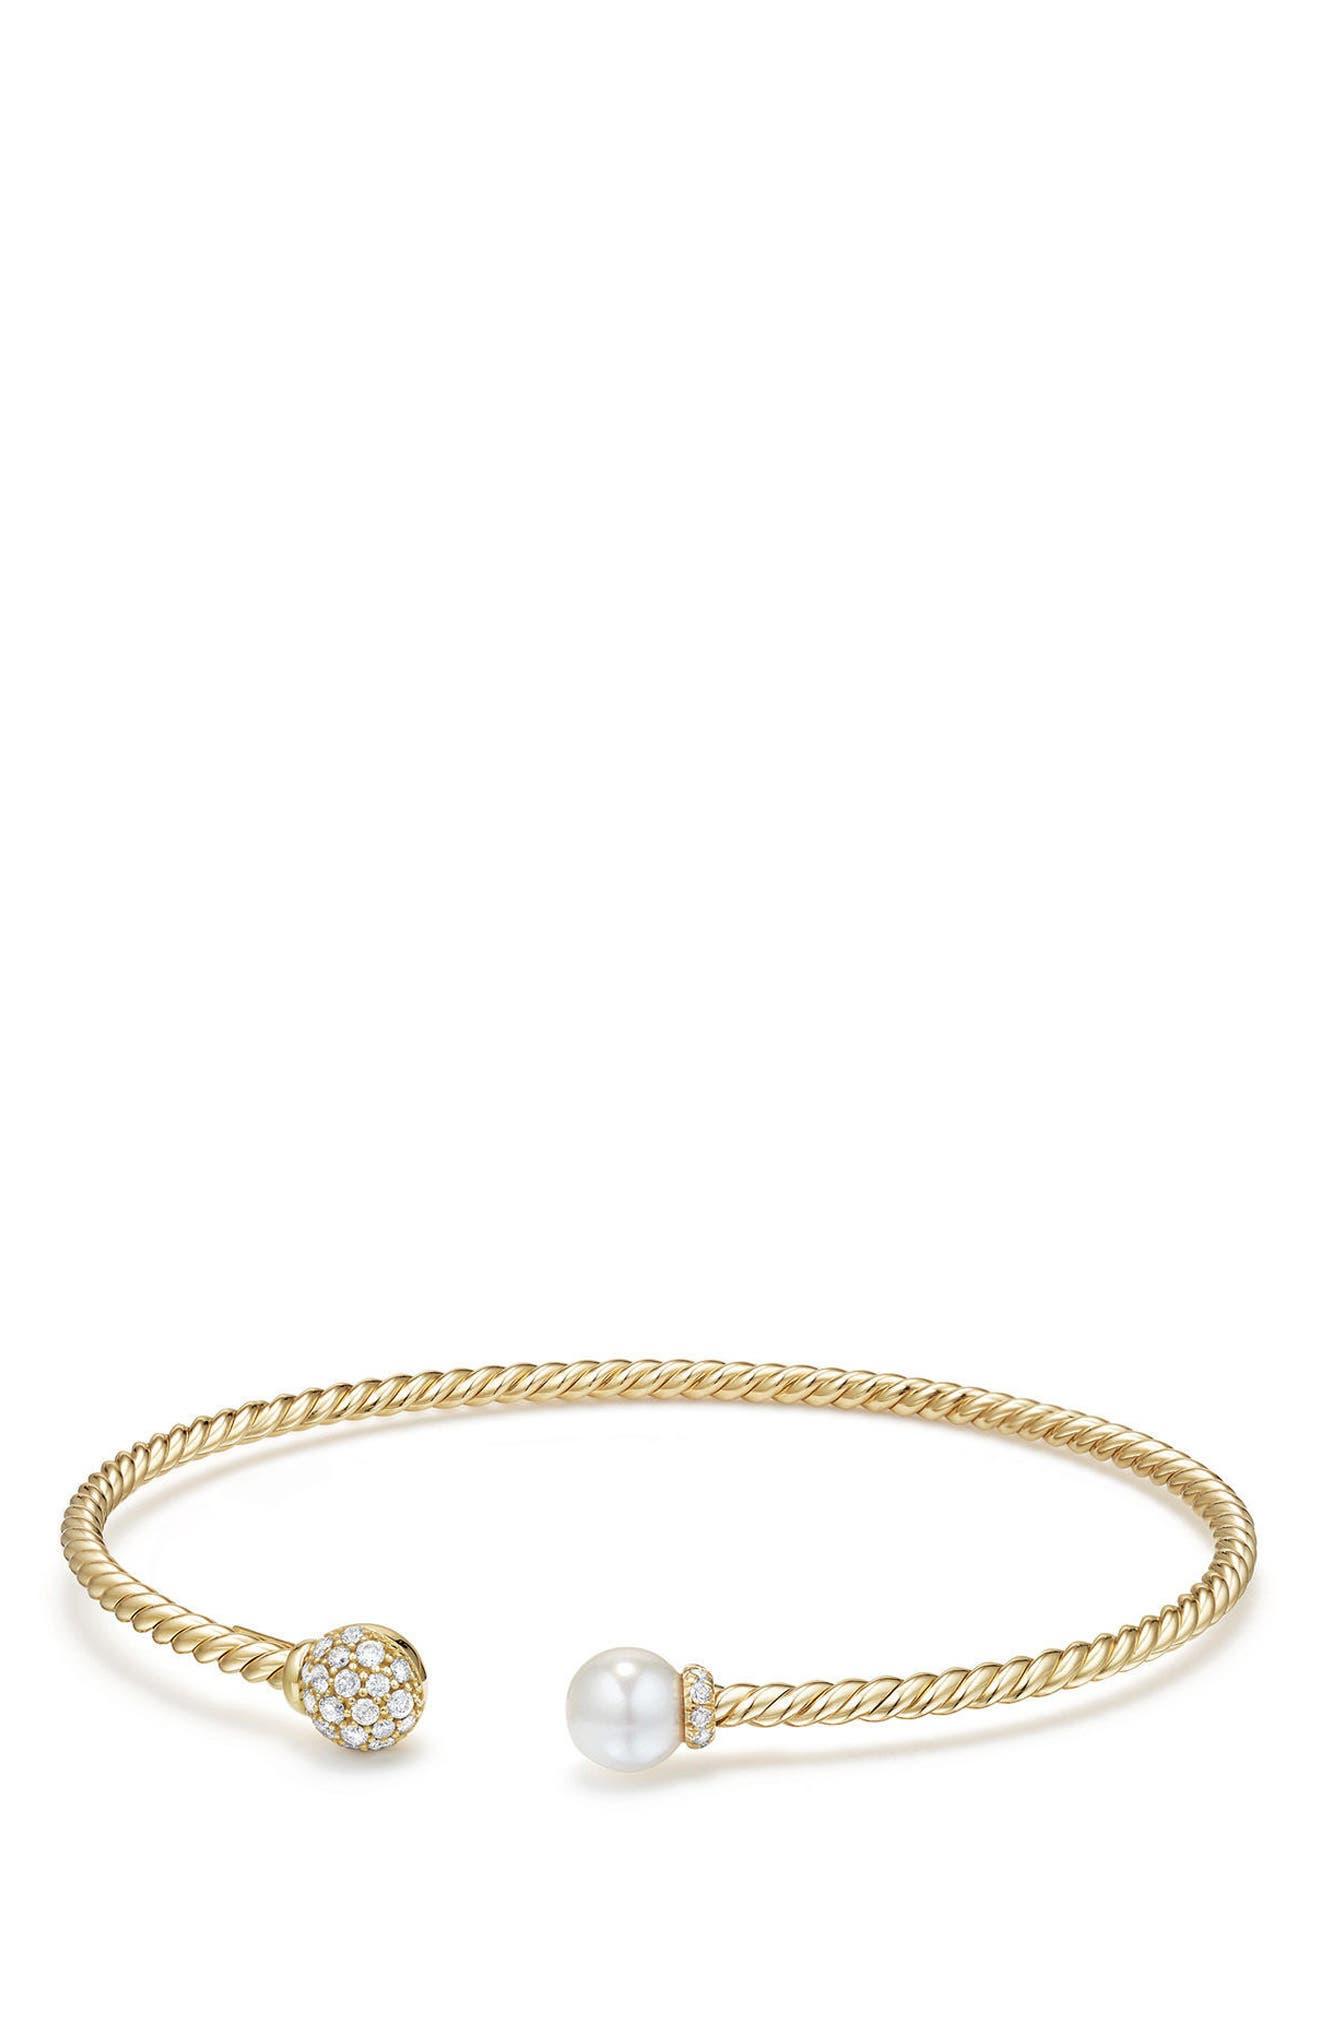 Solari Bead & Pearl Bracelet with Diamonds in 18K Gold,                         Main,                         color, Yellow Gold/ Diamond/ Pearl